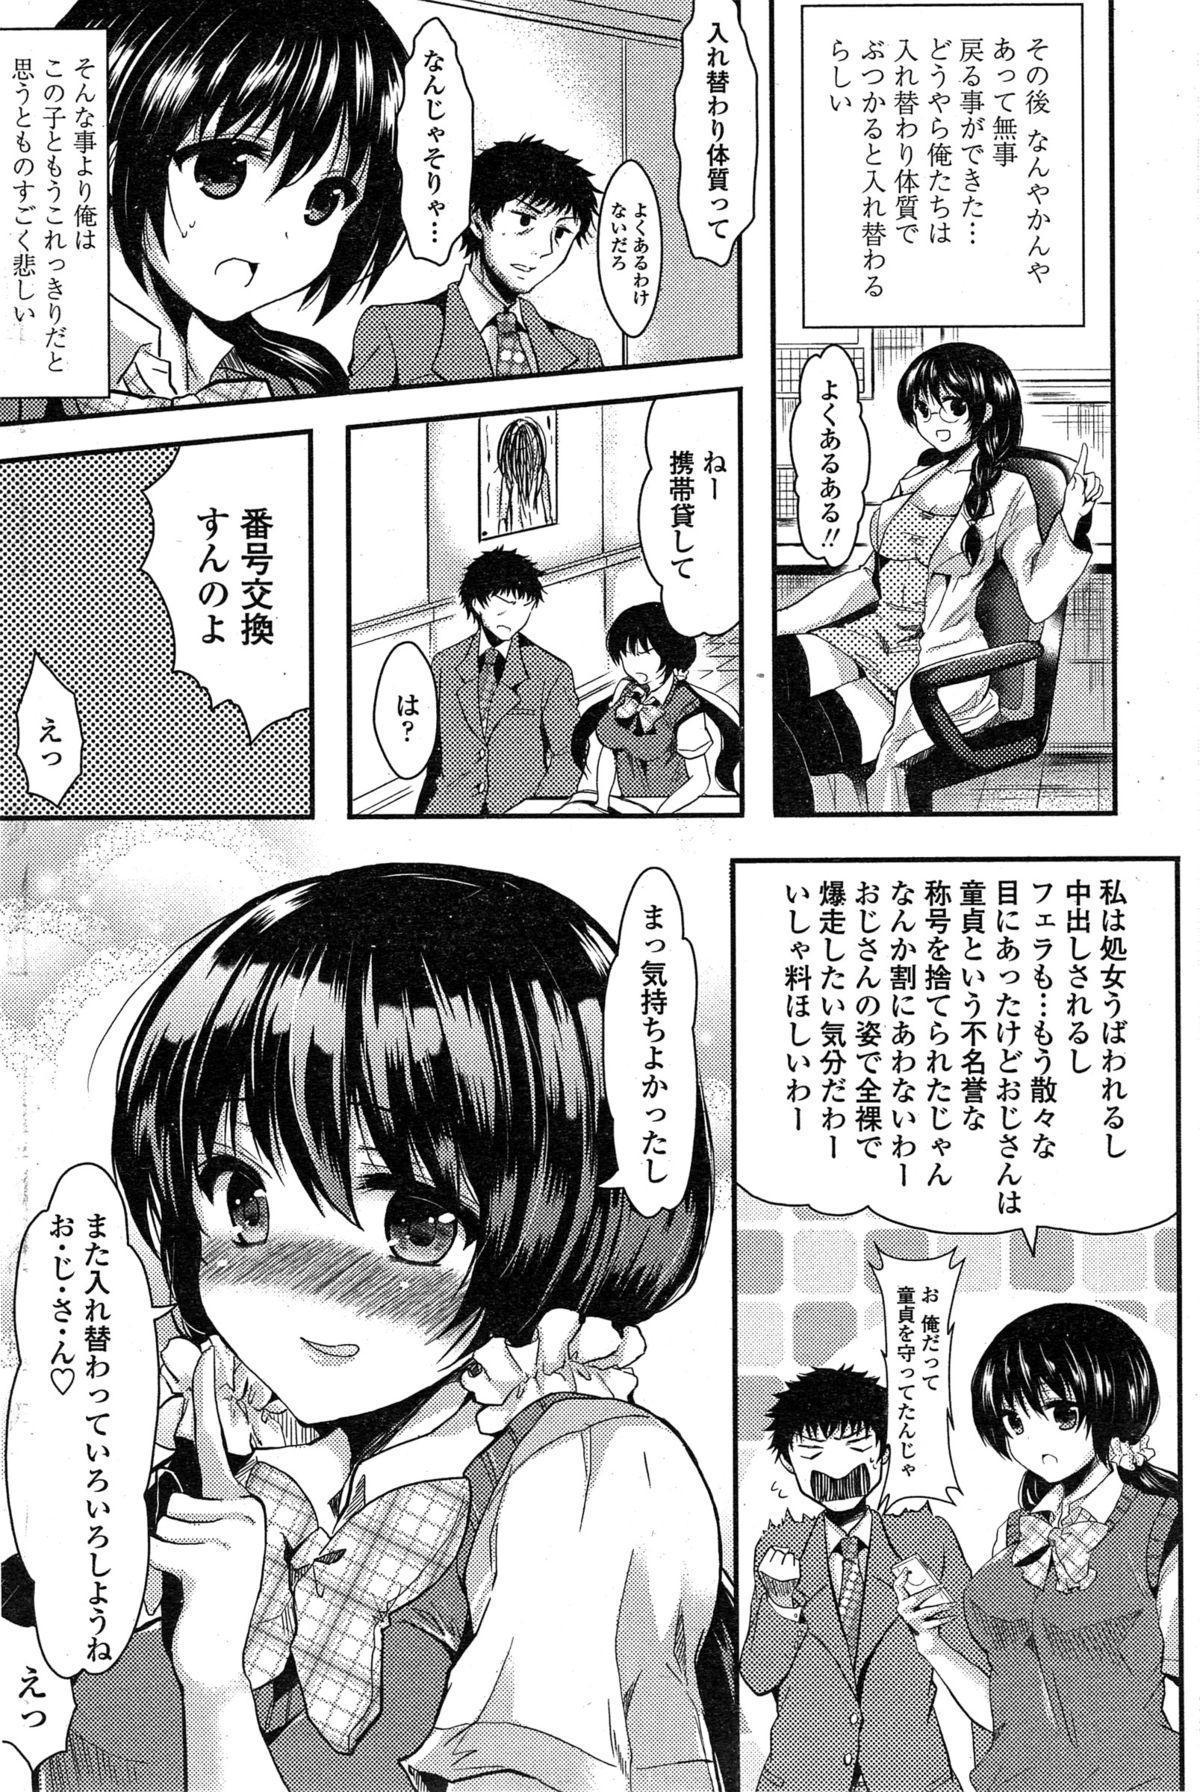 COMIC Penguin Club Sanzokuban 2014-12 185